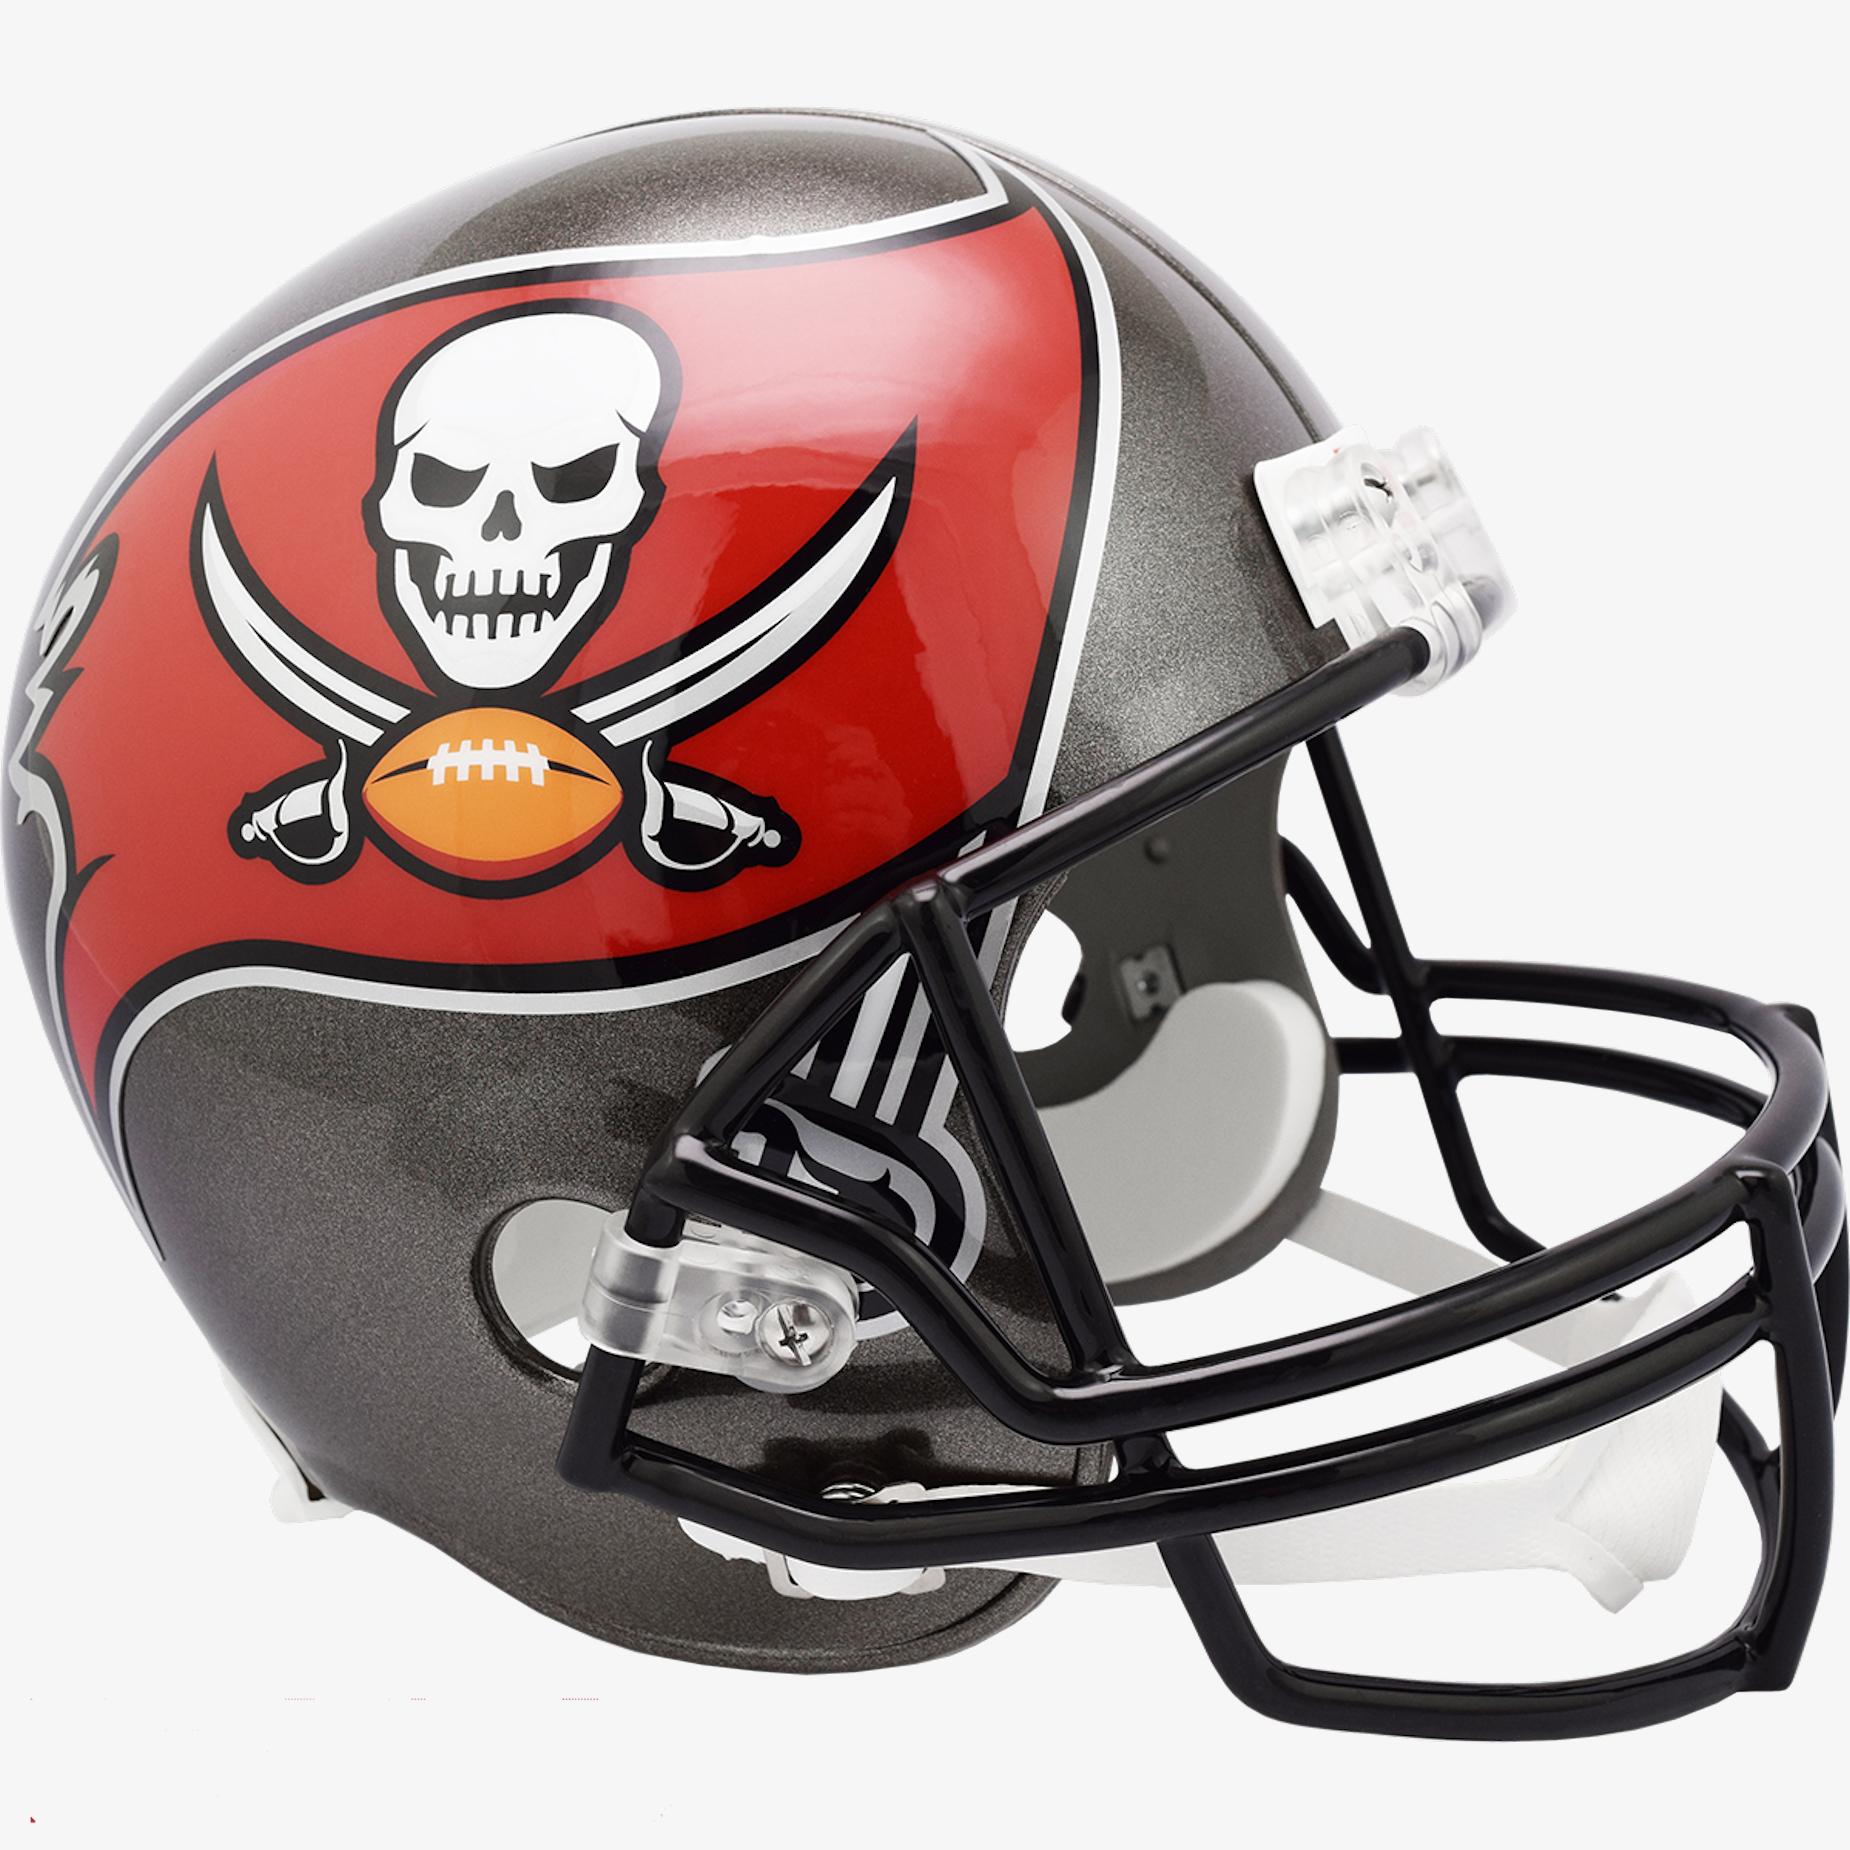 Tampa Bay Buccaneers Full Size Replica Football Helmet <B>NEW 2020</B>